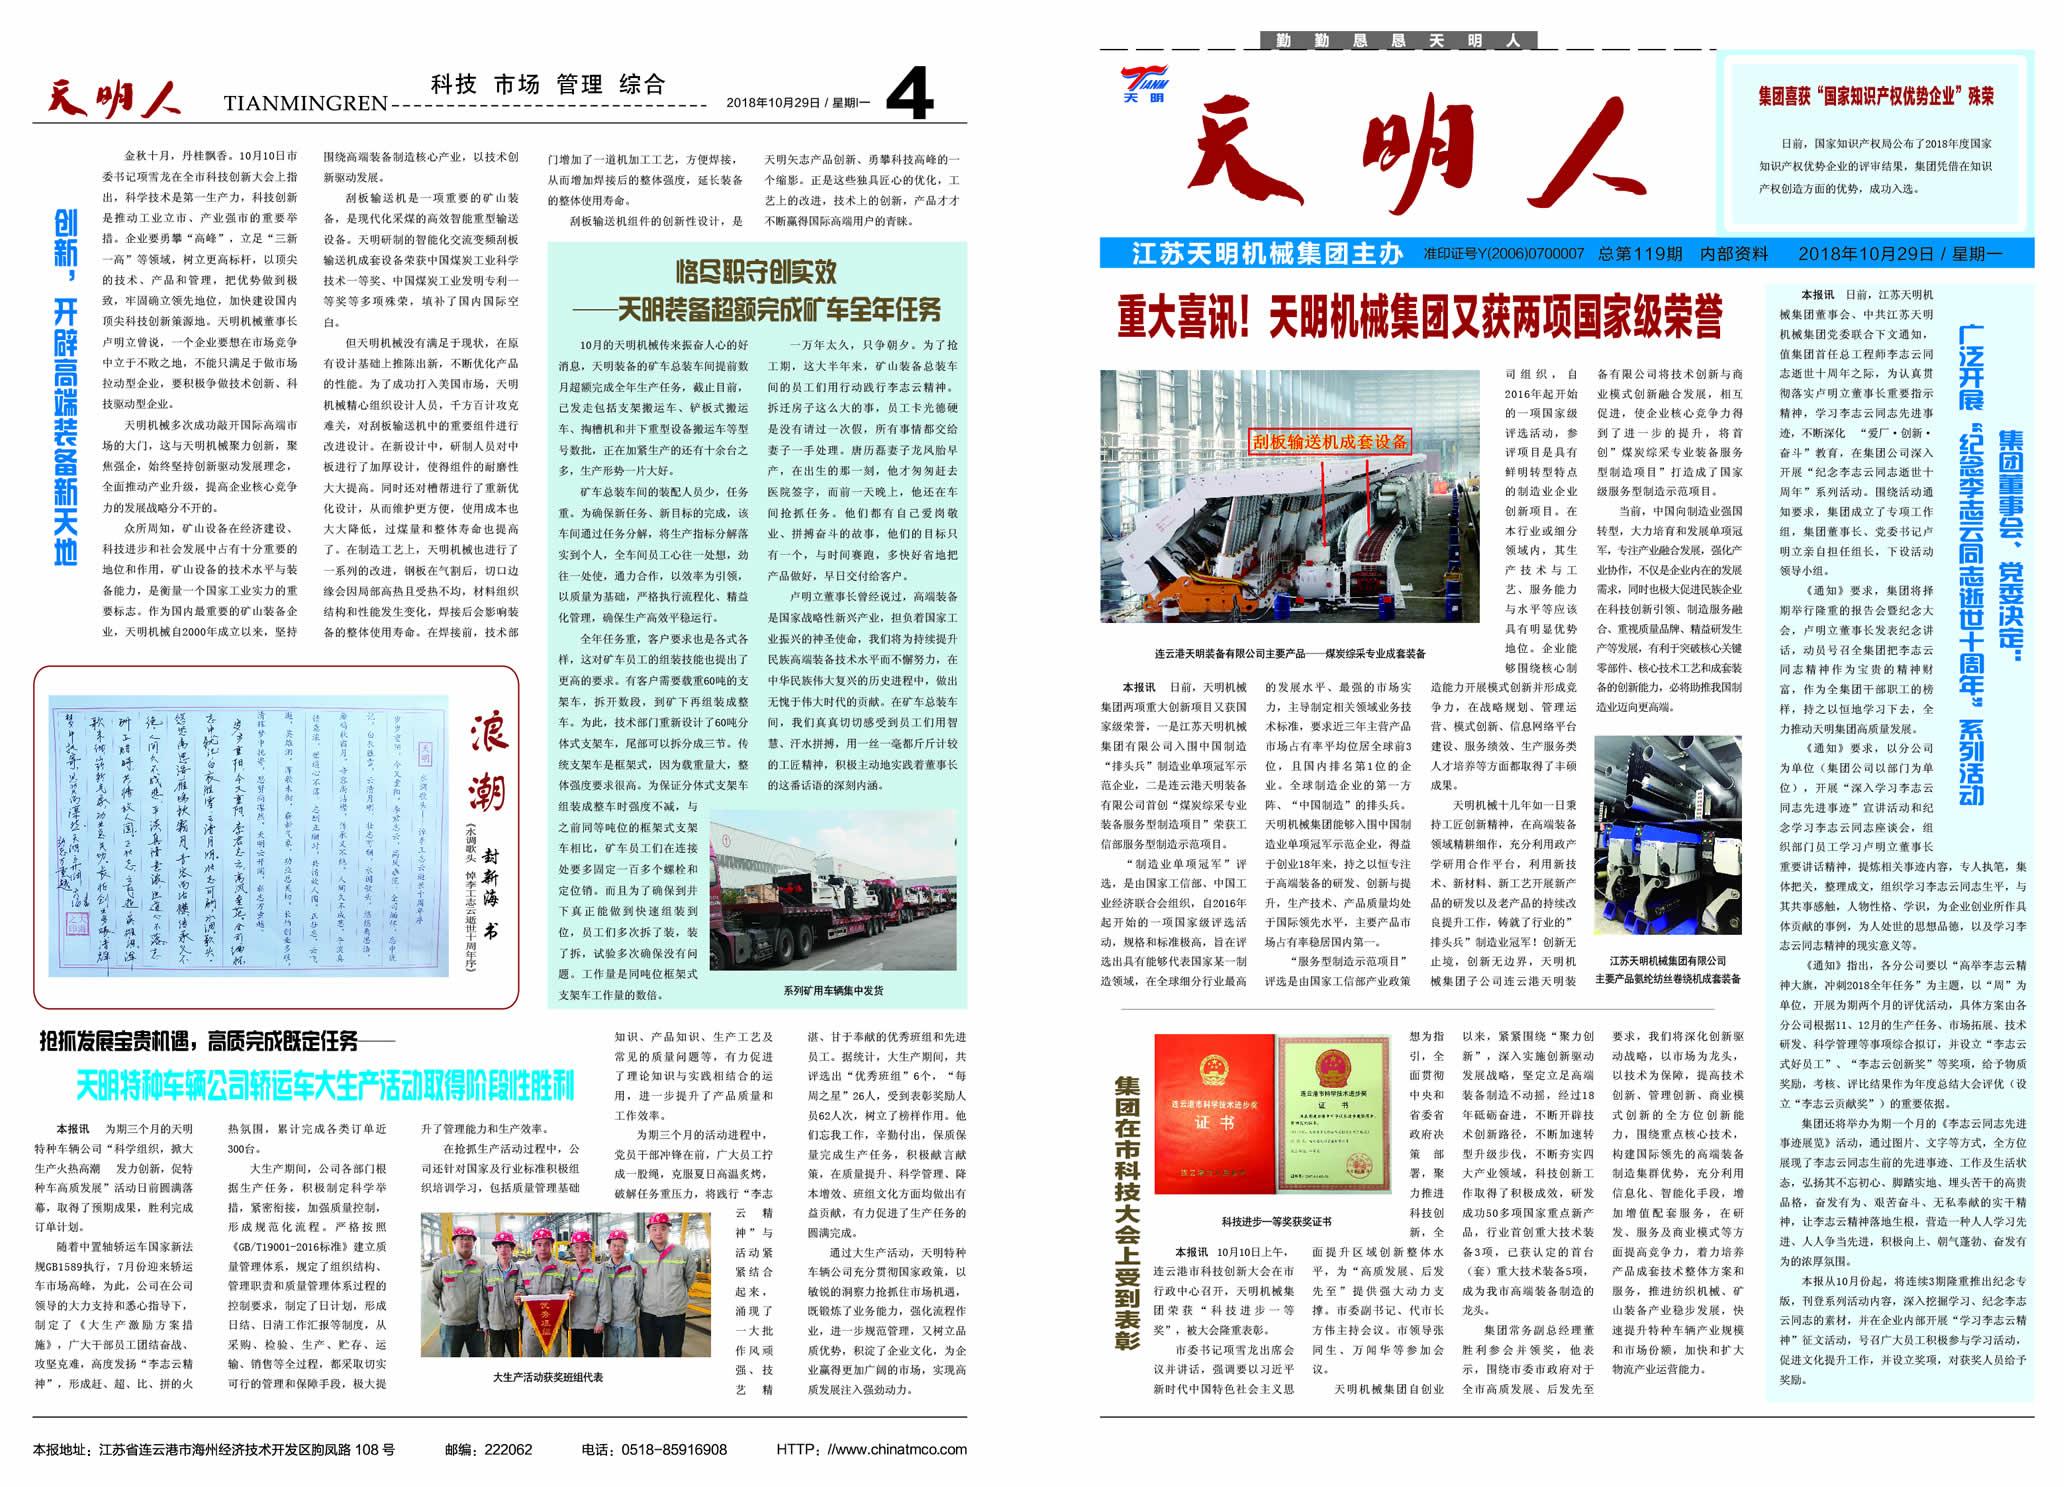 hg711皇冠国际_hg88皇冠国际平台_hg皇冠国际vip首页人2018年第六期(总第119期)1、4版